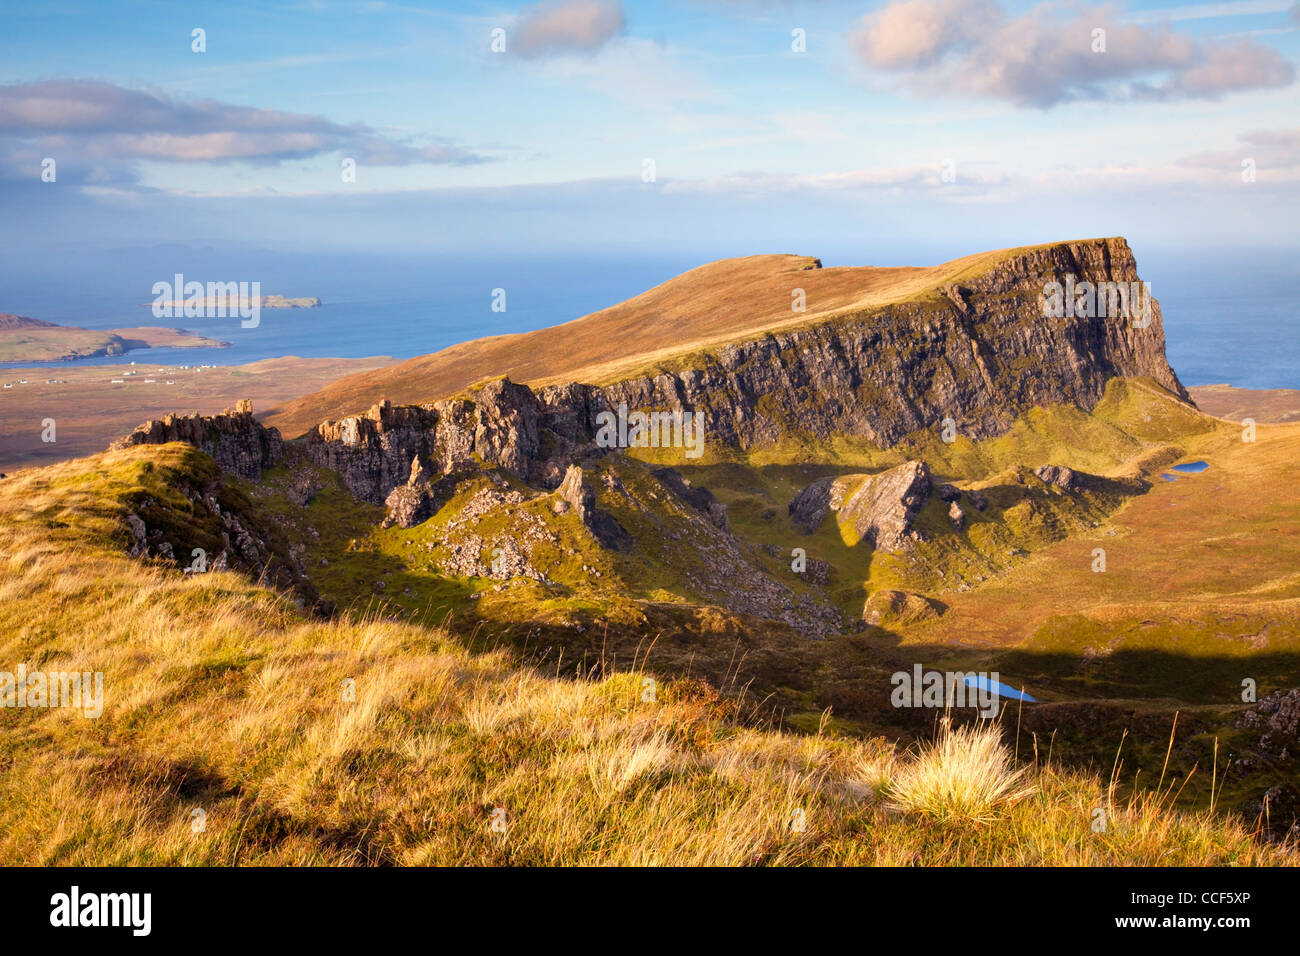 The Trotterish Ridge at Fir Bhreugach, part of the popular circular  Quiraing walk on the Isle of Skye - Stock Image